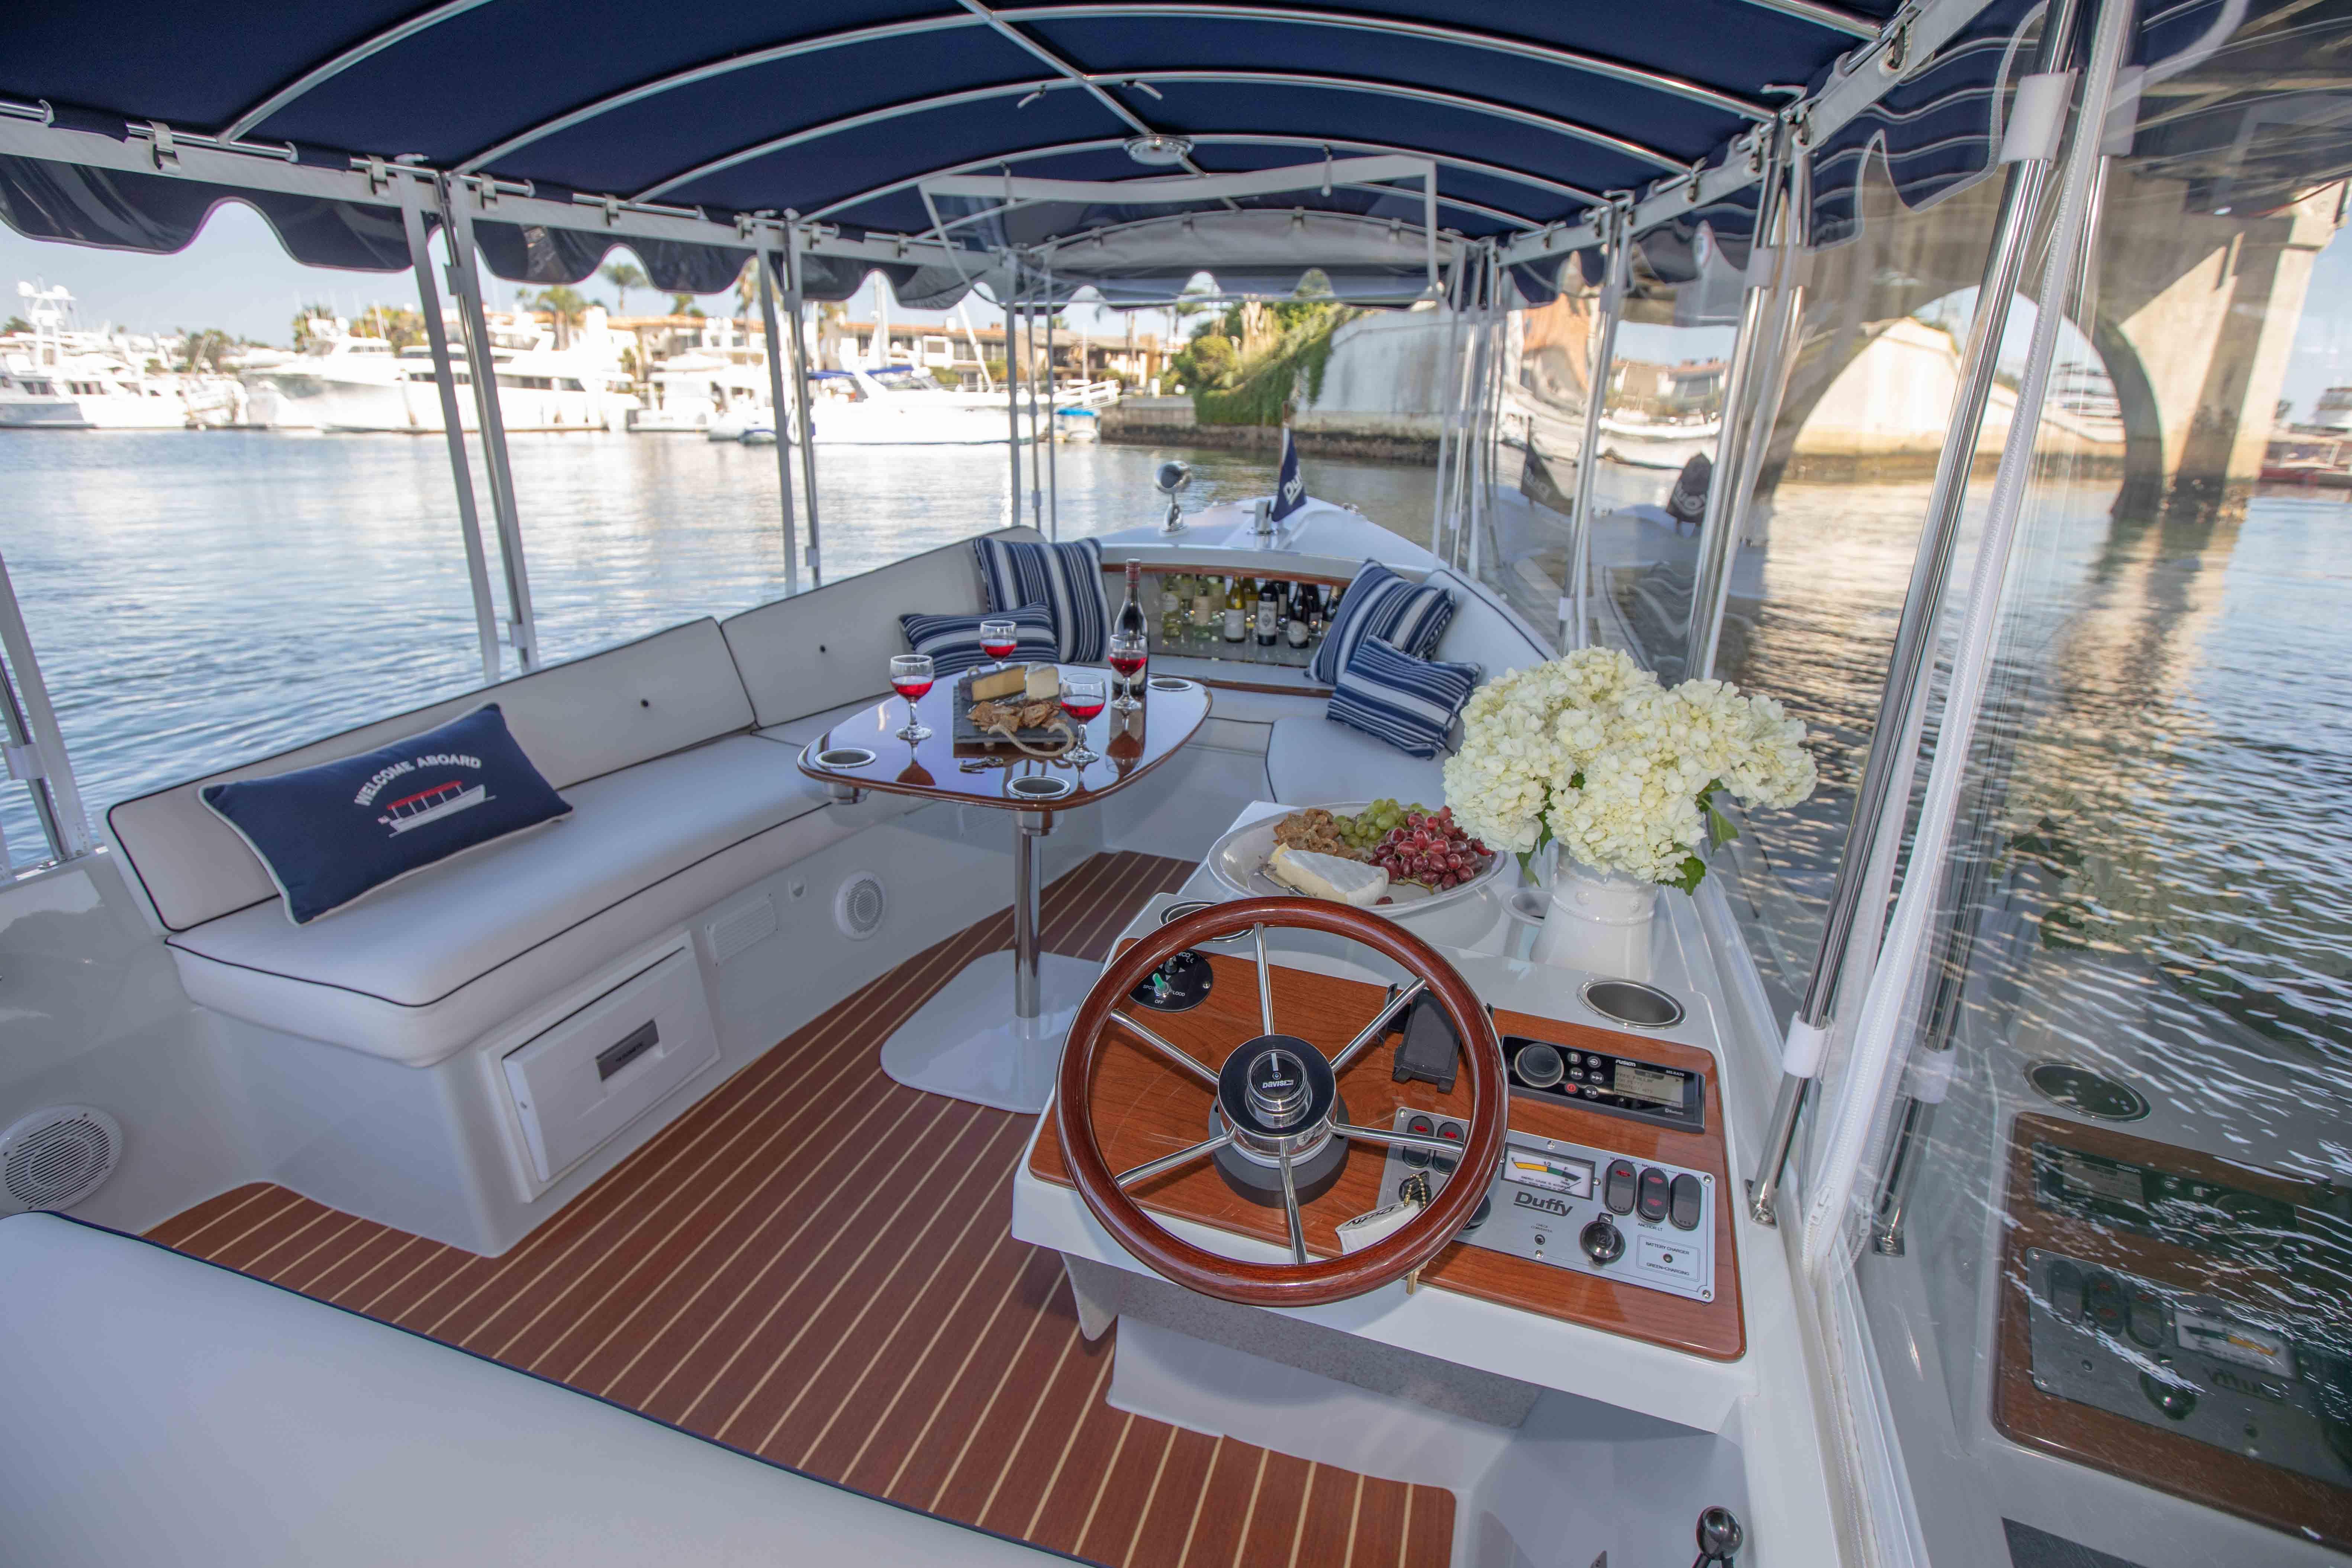 duffyelectricboats11